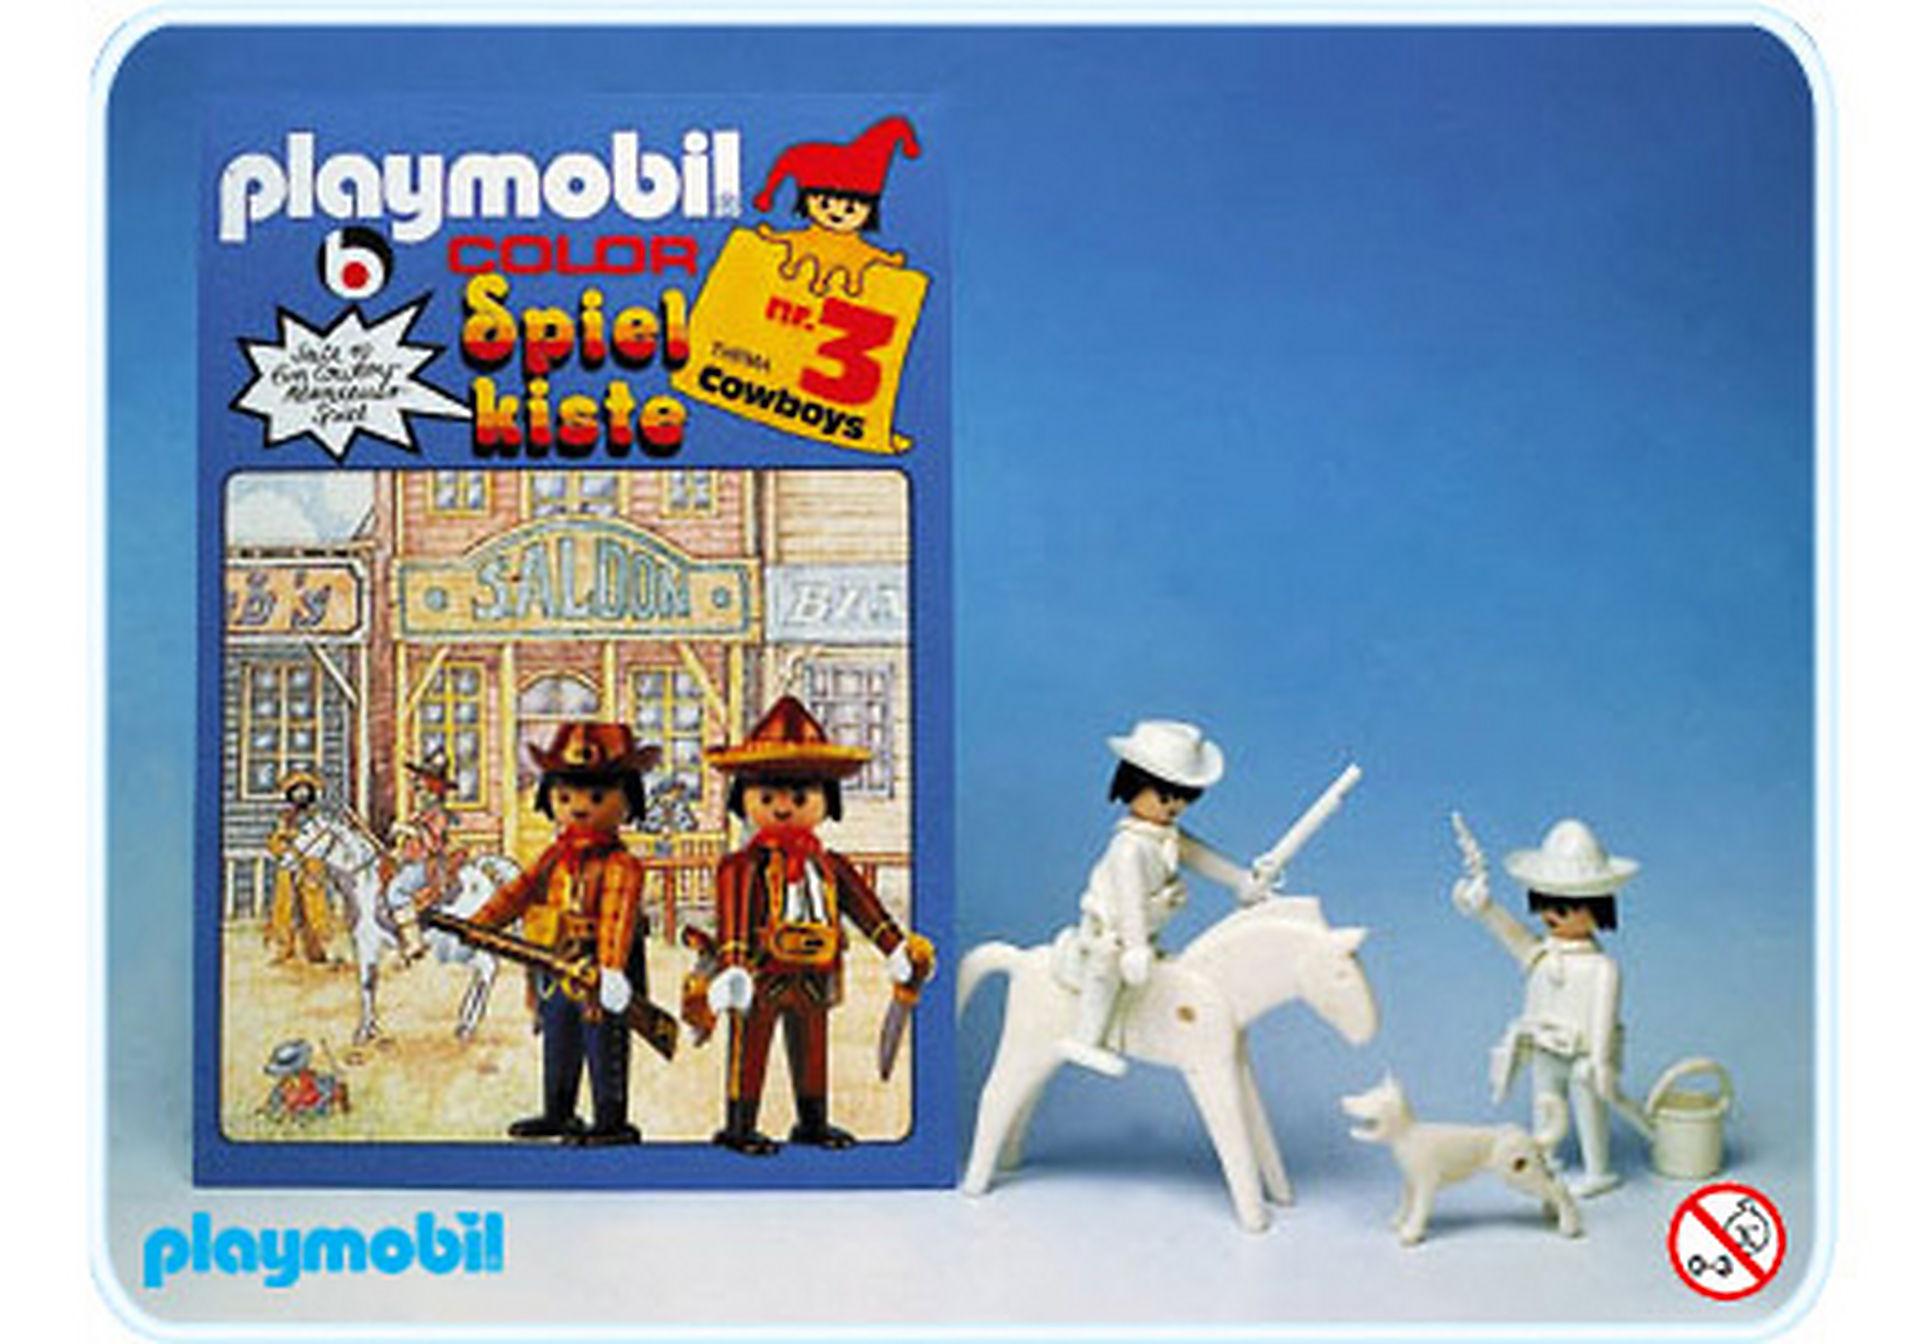 3623-A Spielkiste Nr. 3 - Cowboys zoom image1